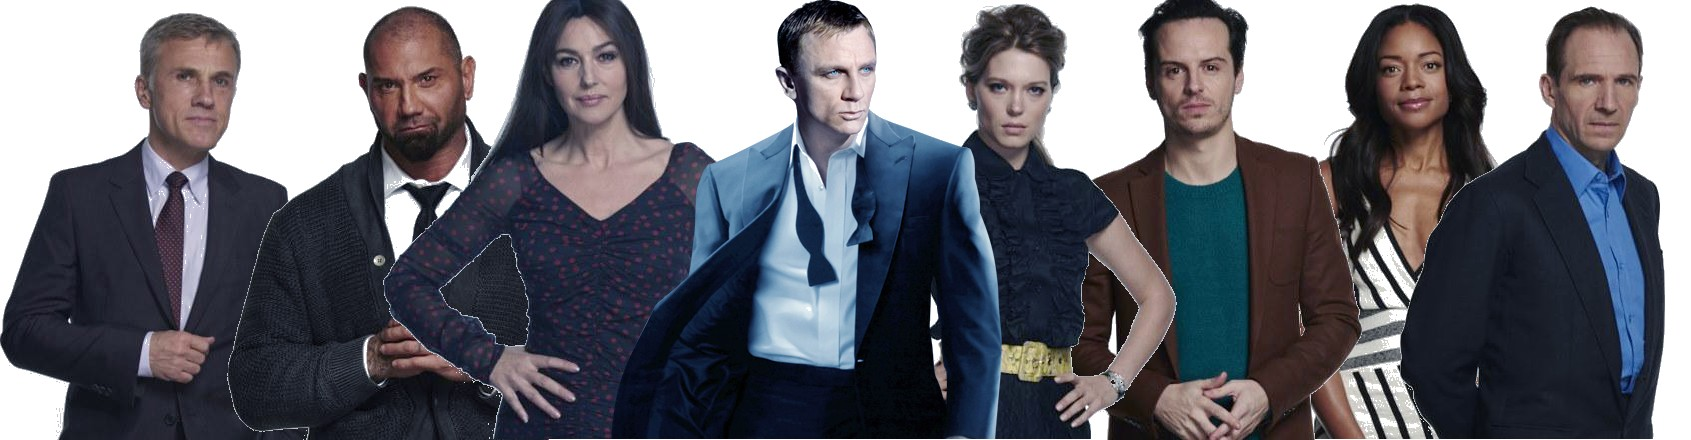 24 Bond Spectre Cast